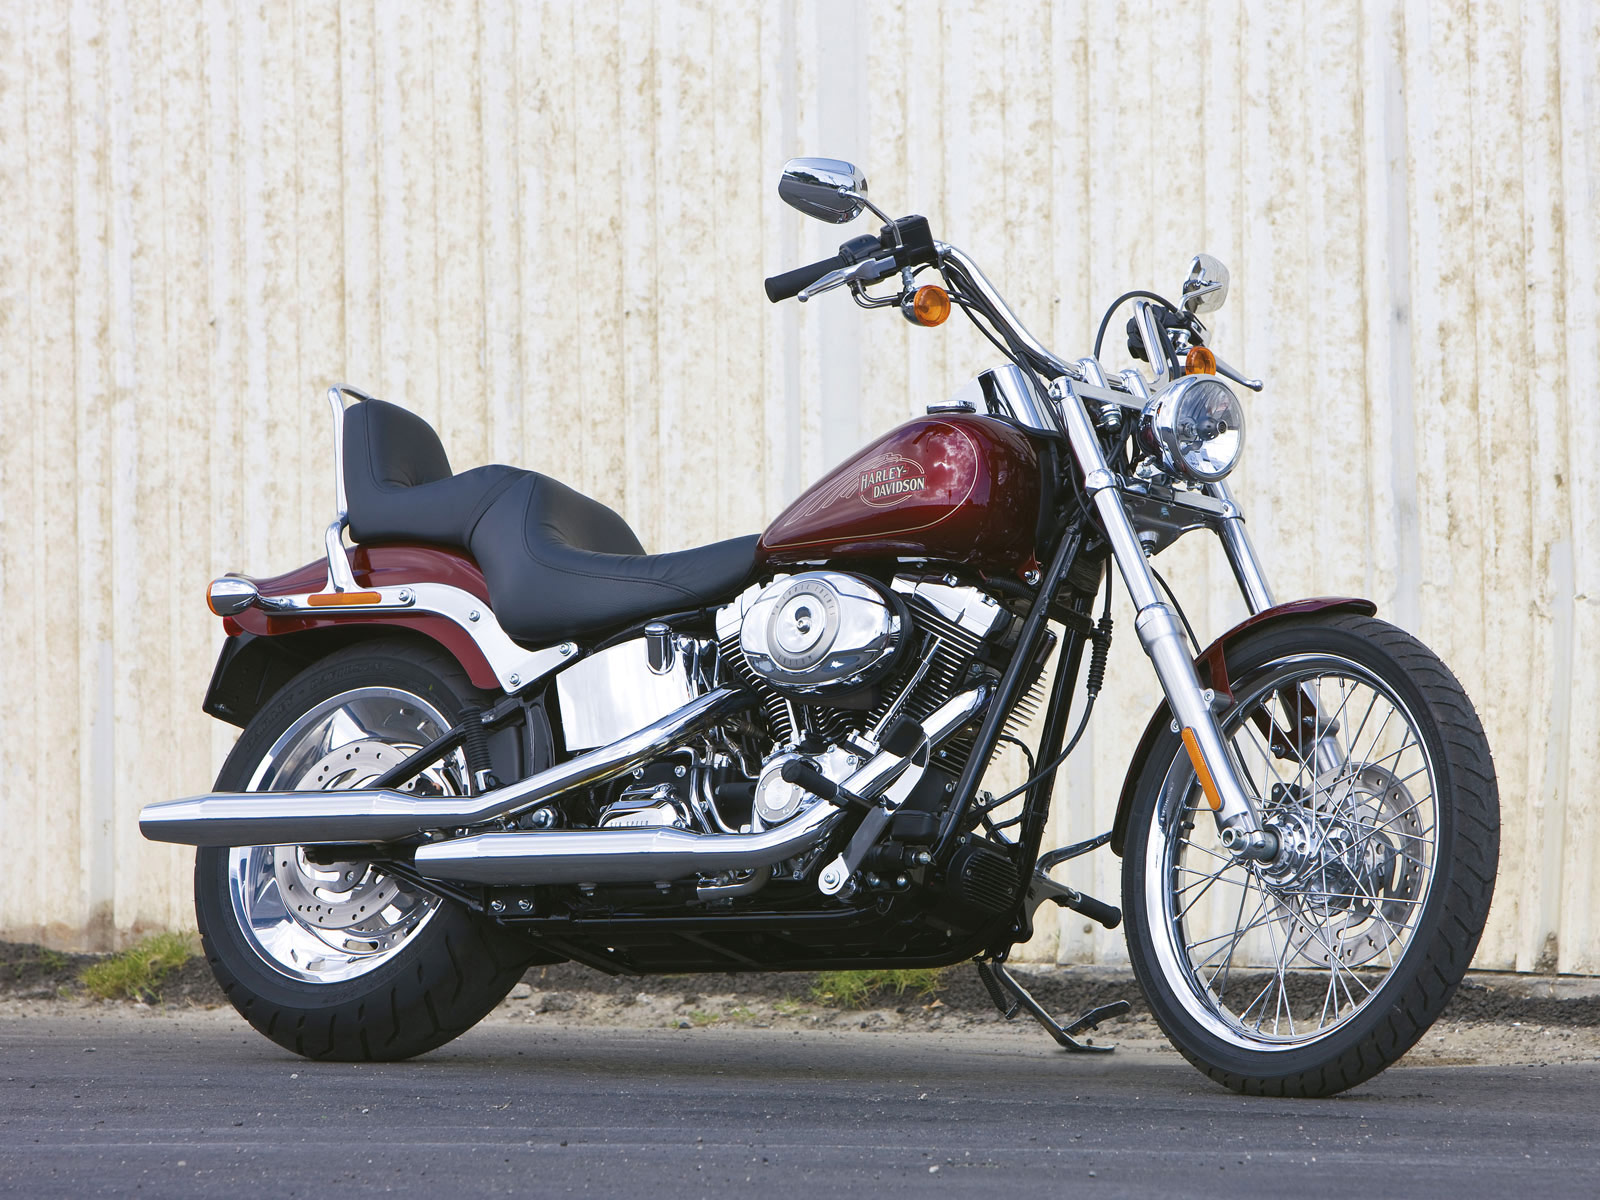 Harley Davidson Softail: 2009 Harley-Davidson FXSTC Softail Custom Pictures